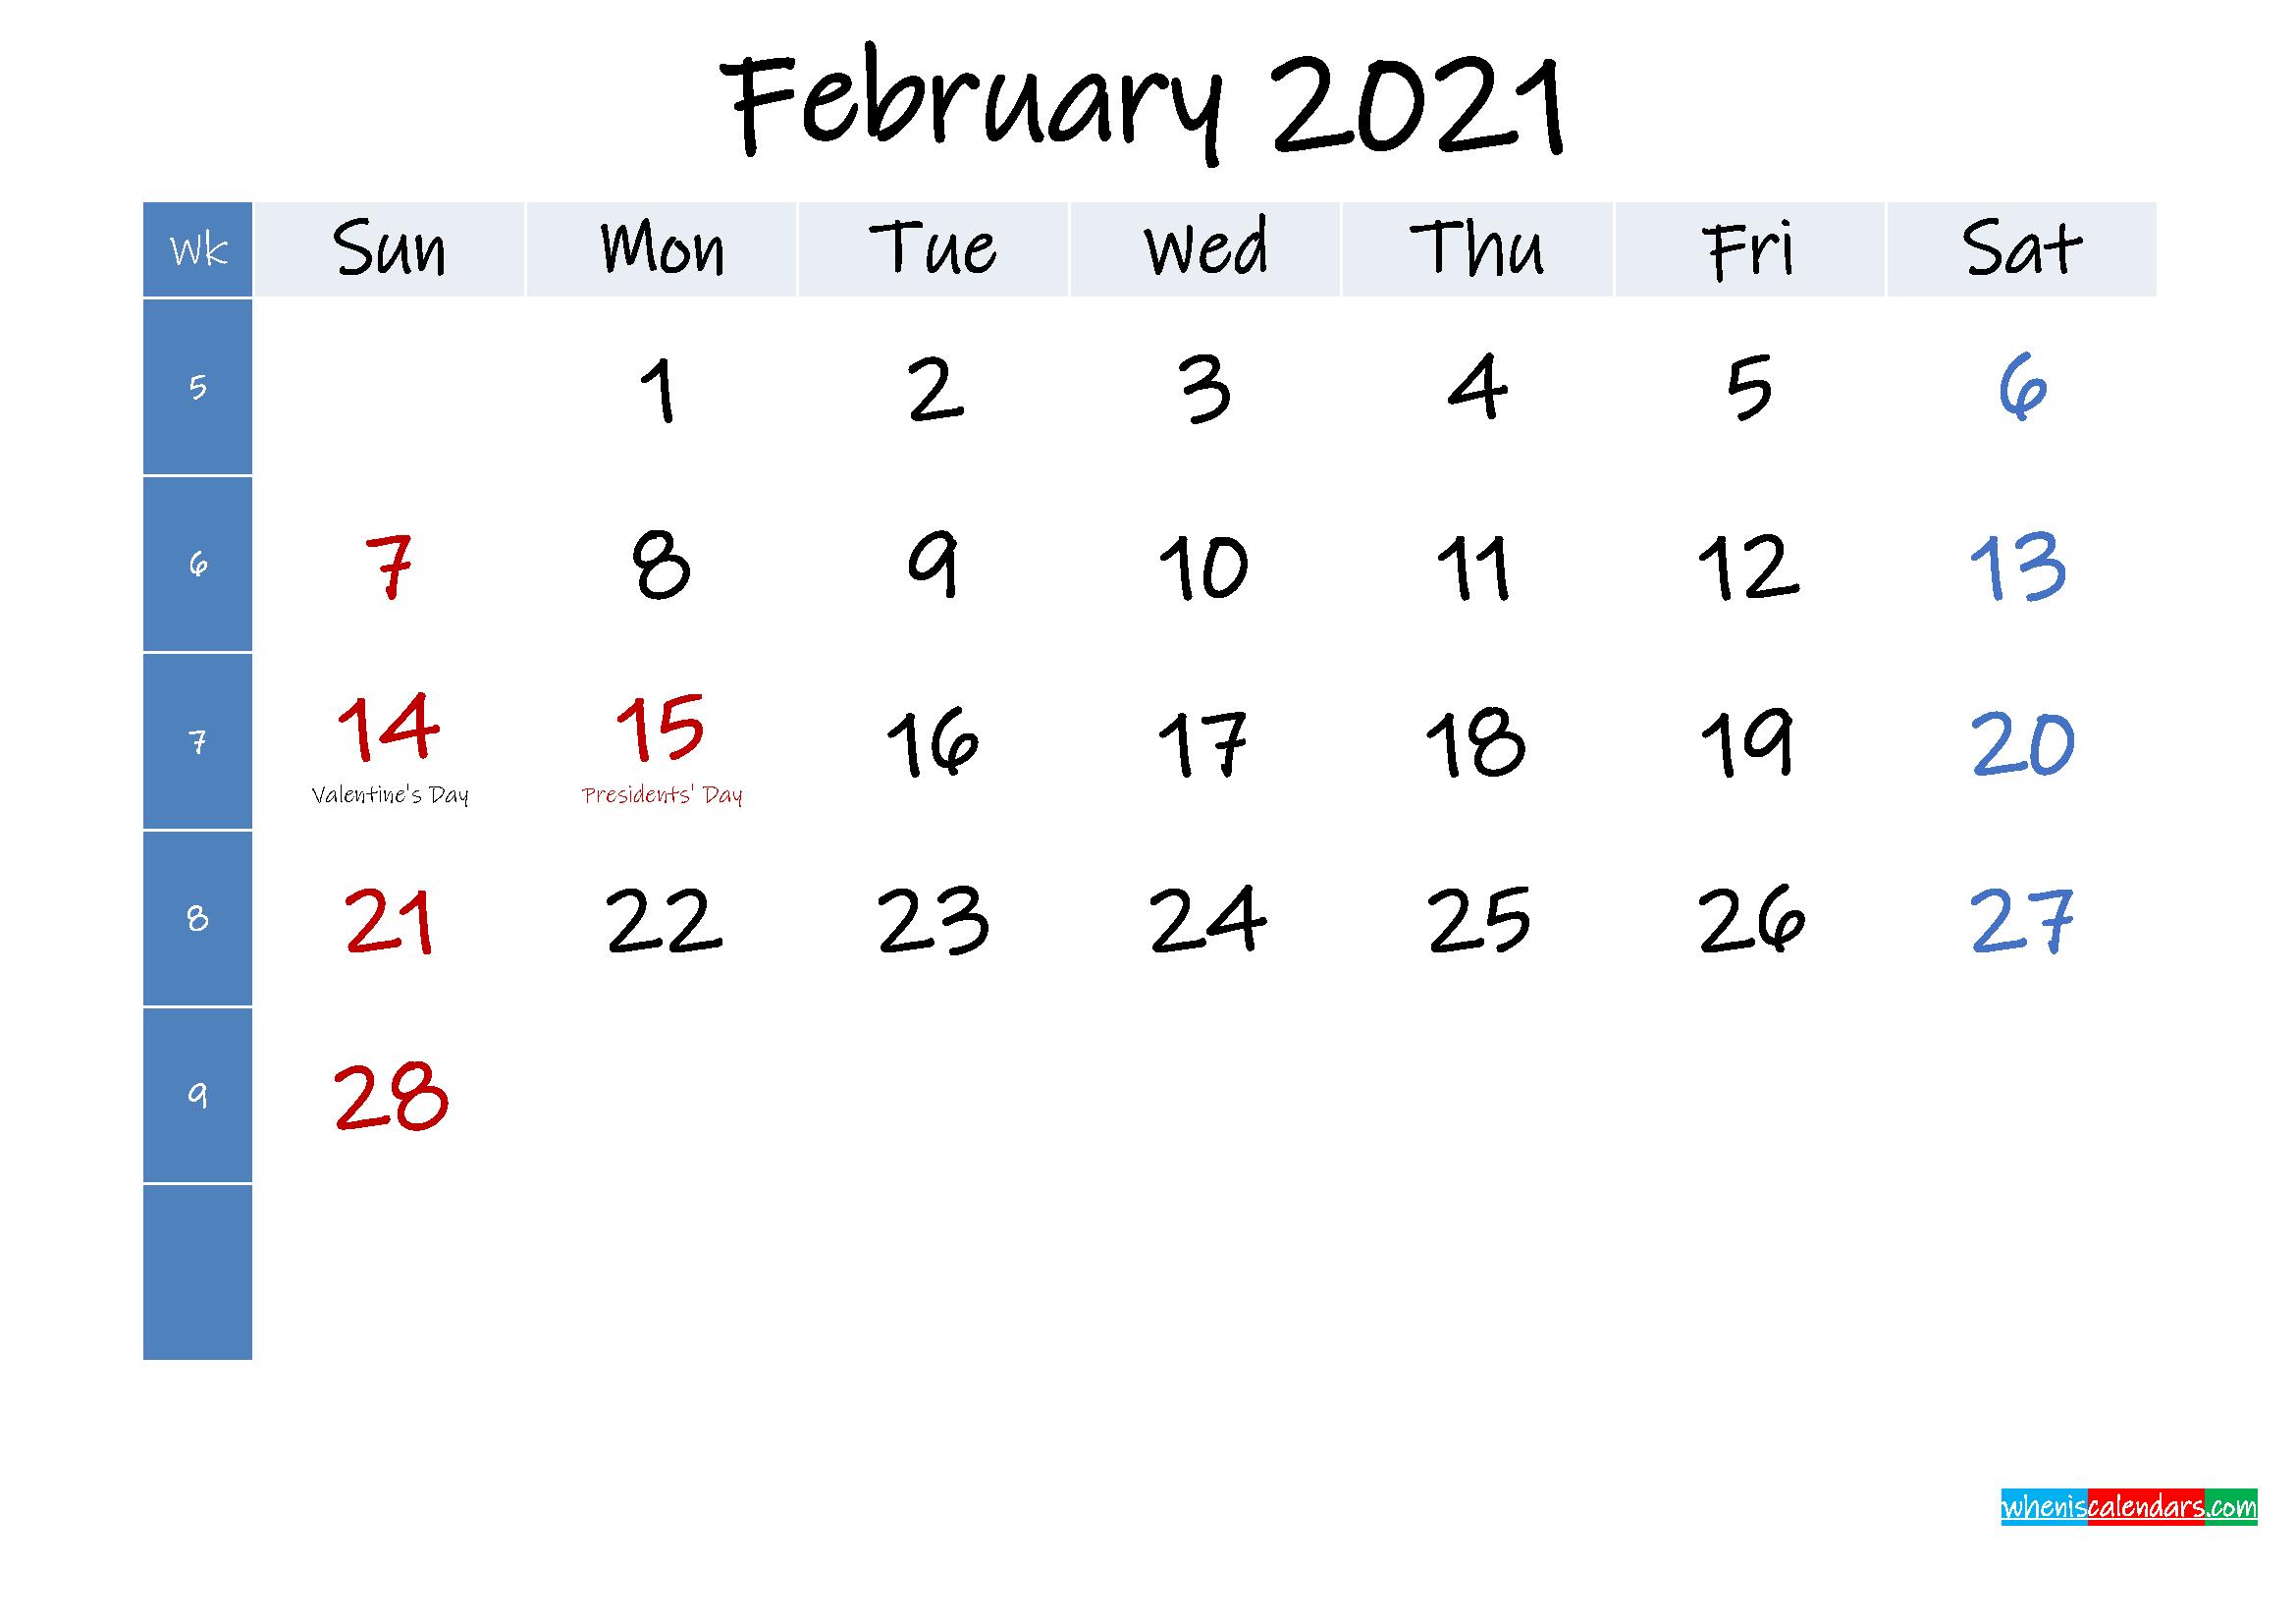 February 2021 Free Printable Calendar with Holidays